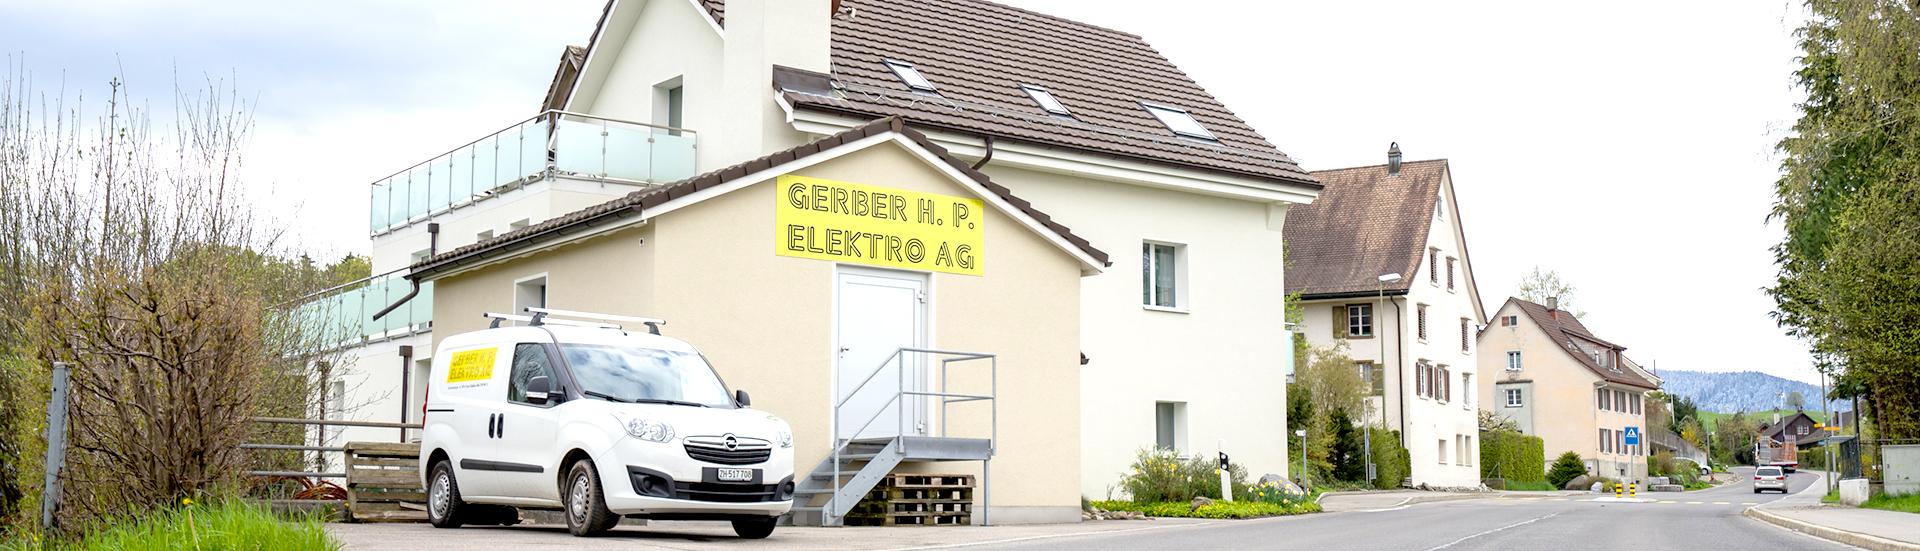 Firma Gerber H.P. Elektro AG